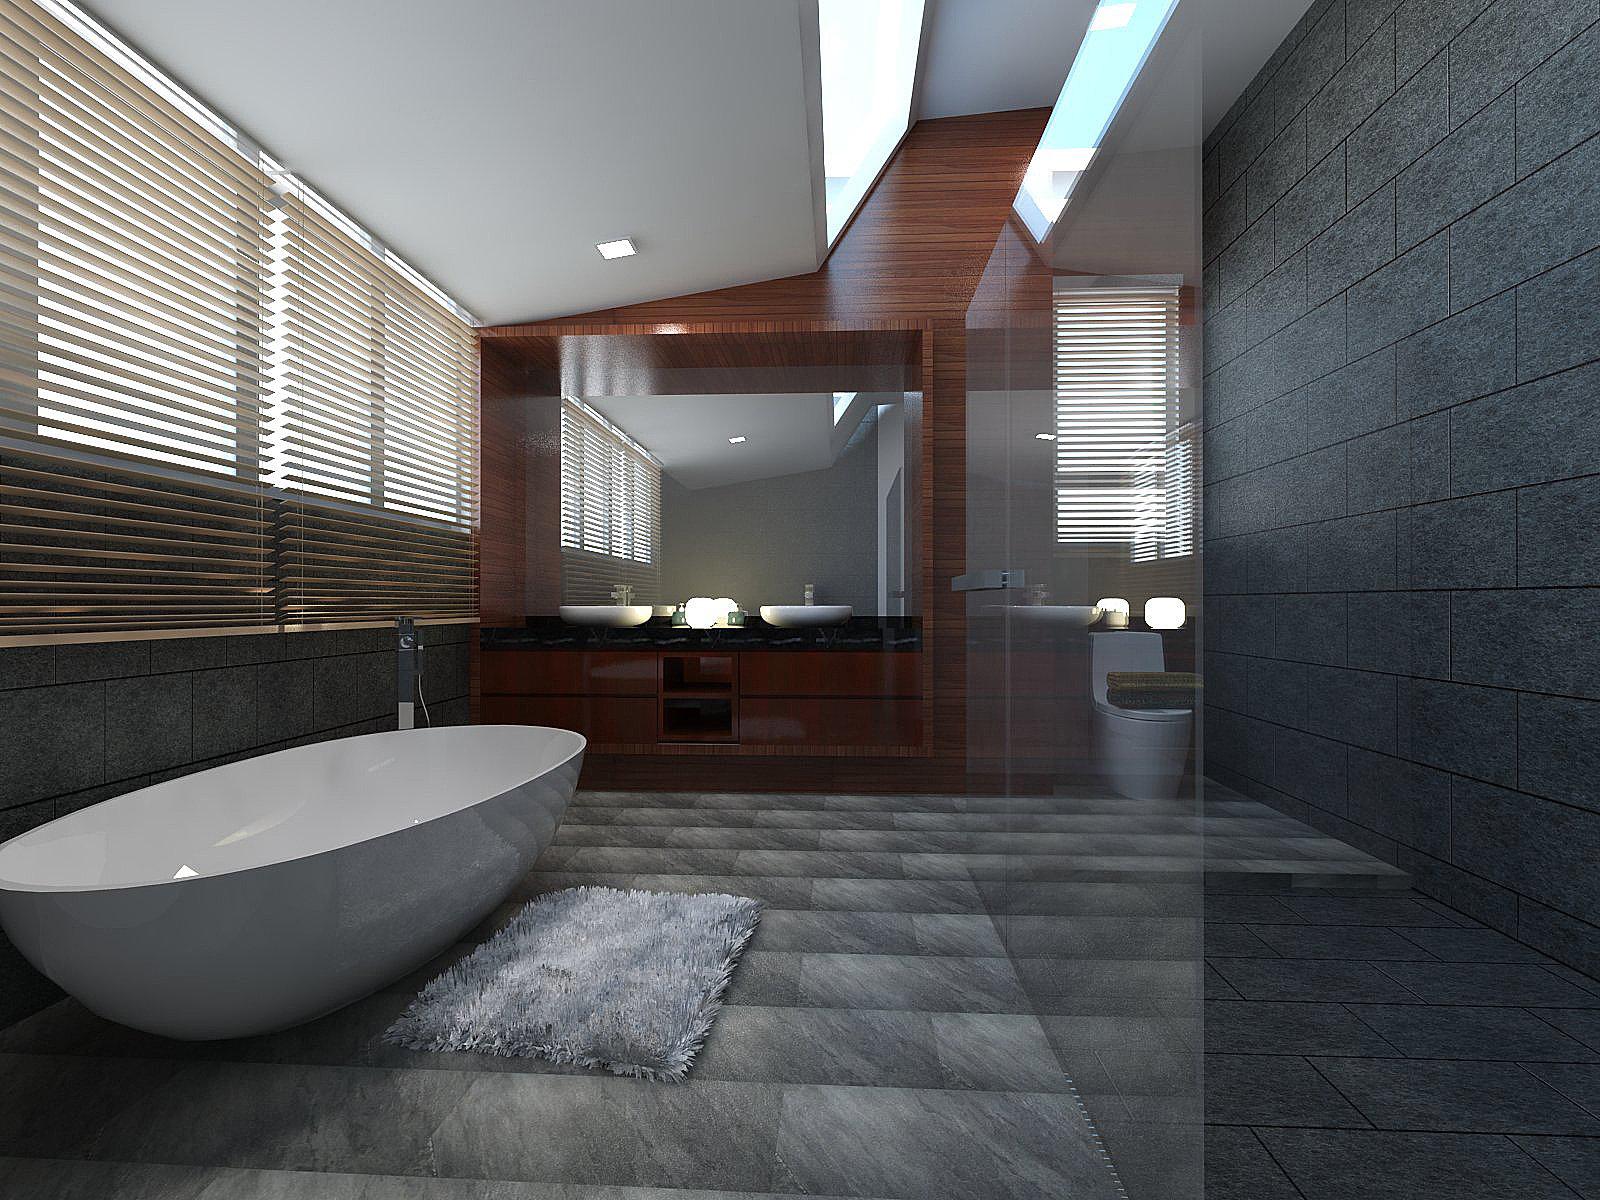 HD wallpapers freelance interior designer